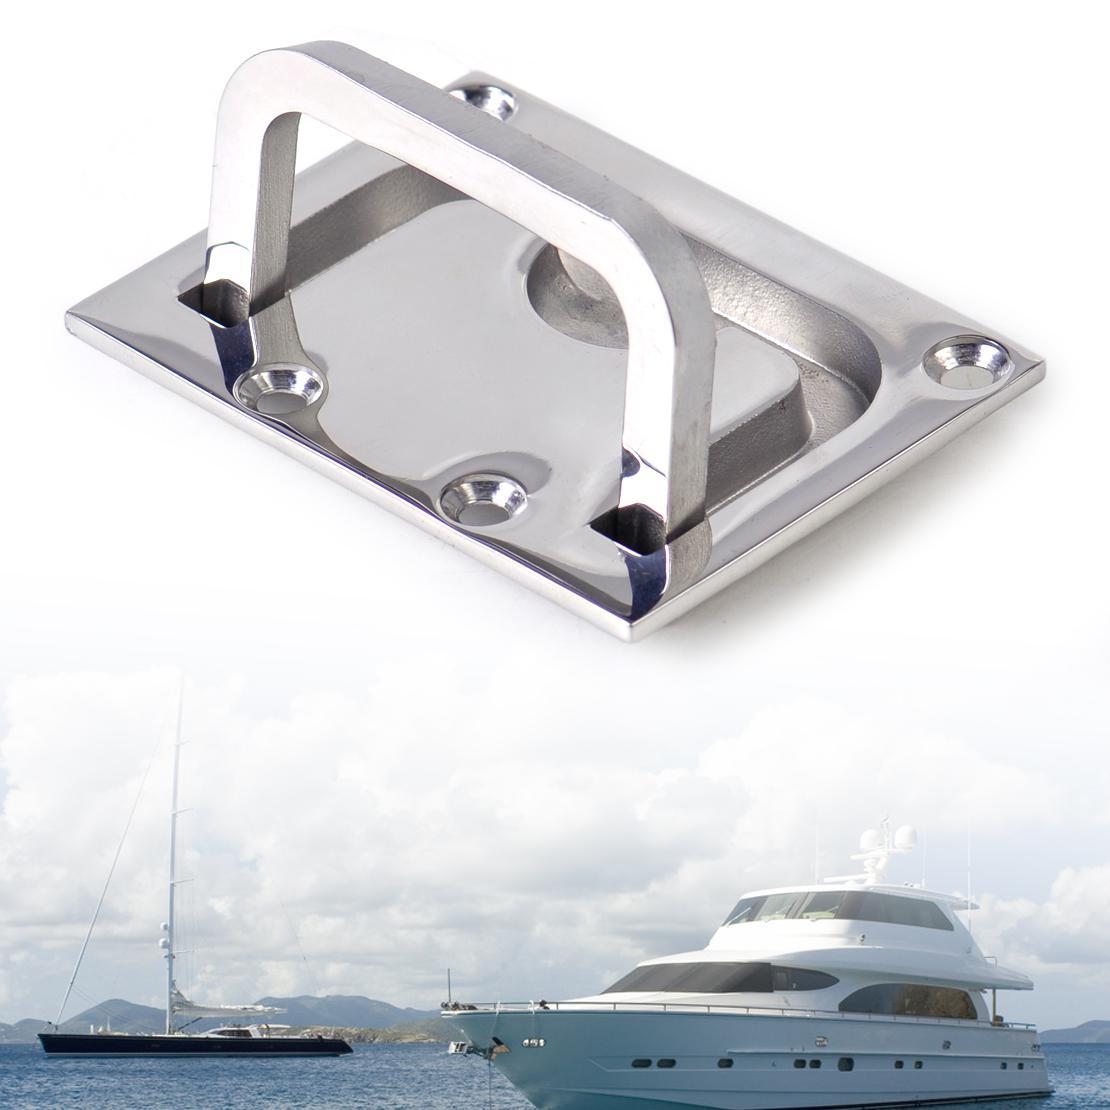 Wholesale- New Car 316 Stainless Steel Boat Marine Flush Hatch Locker  Cabinet Lift Pull Handle Boat Hatch Handle 7 5 x 5 5 cm Flush Mount